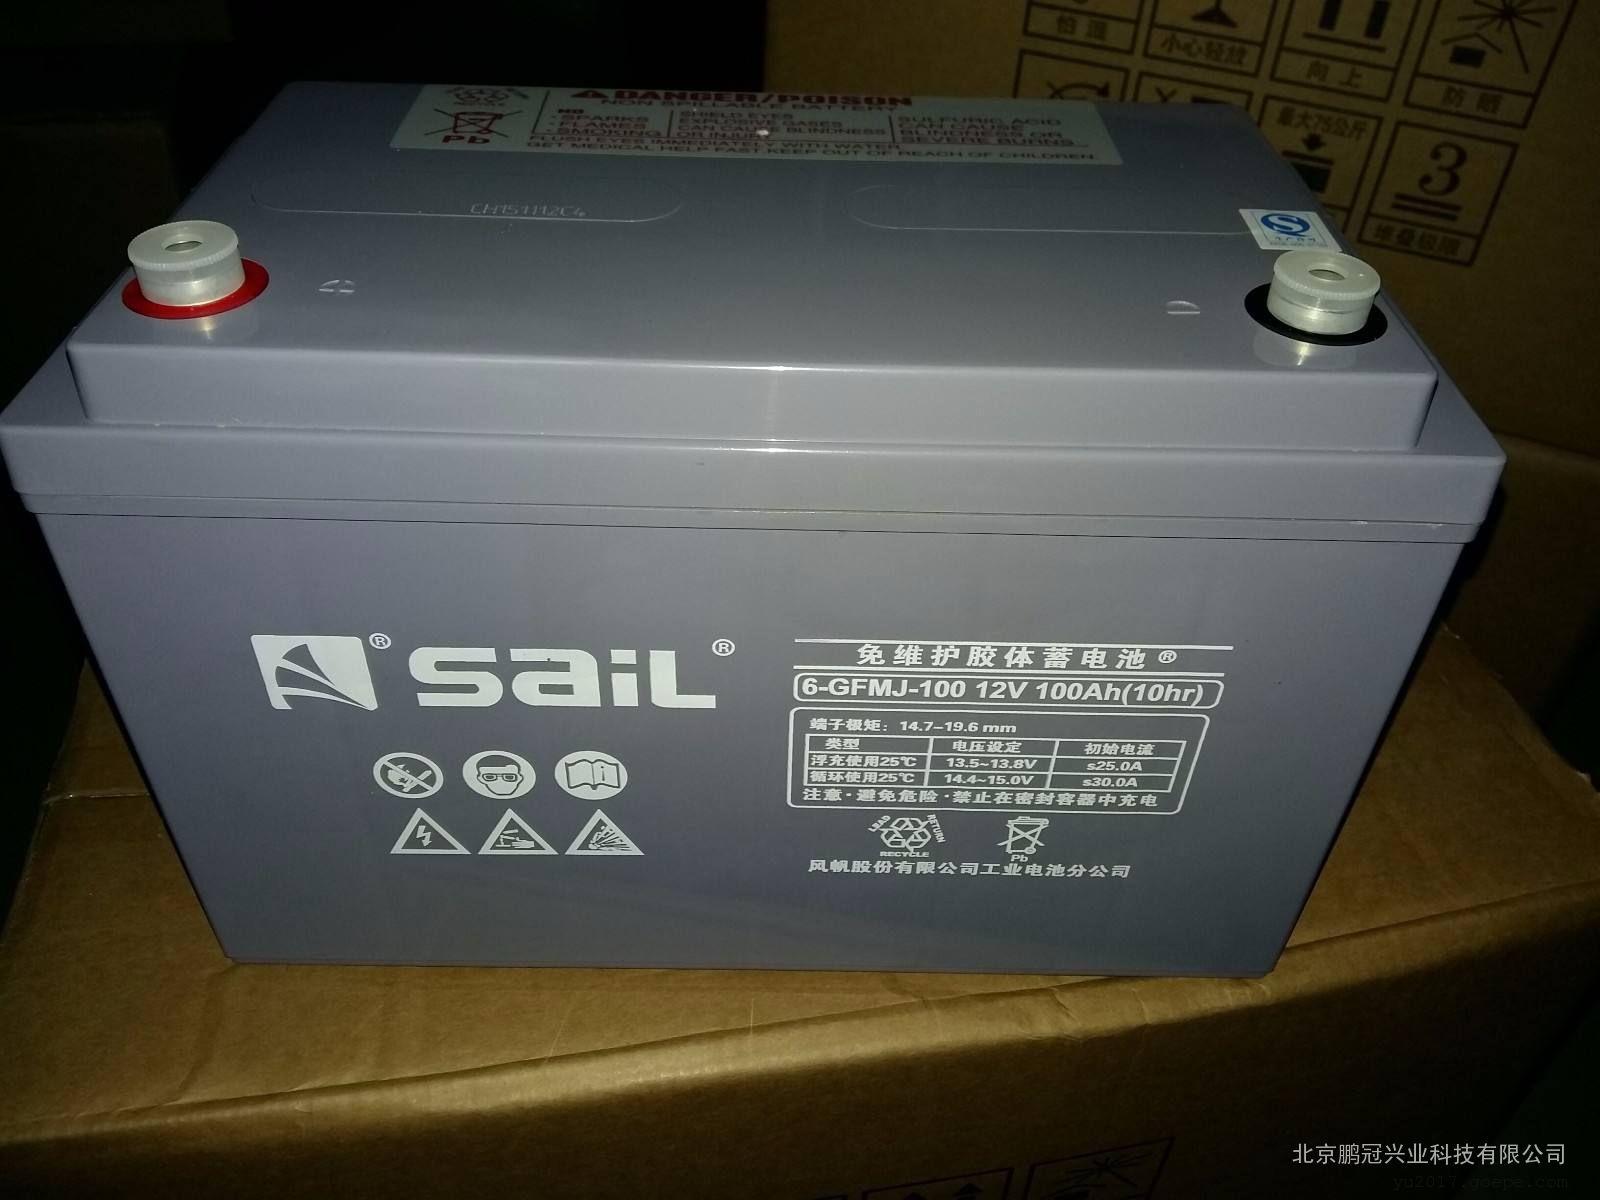 SaiL风帆6-GFM-33 12V33AH/10HR阀控密封铅酸蓄电池